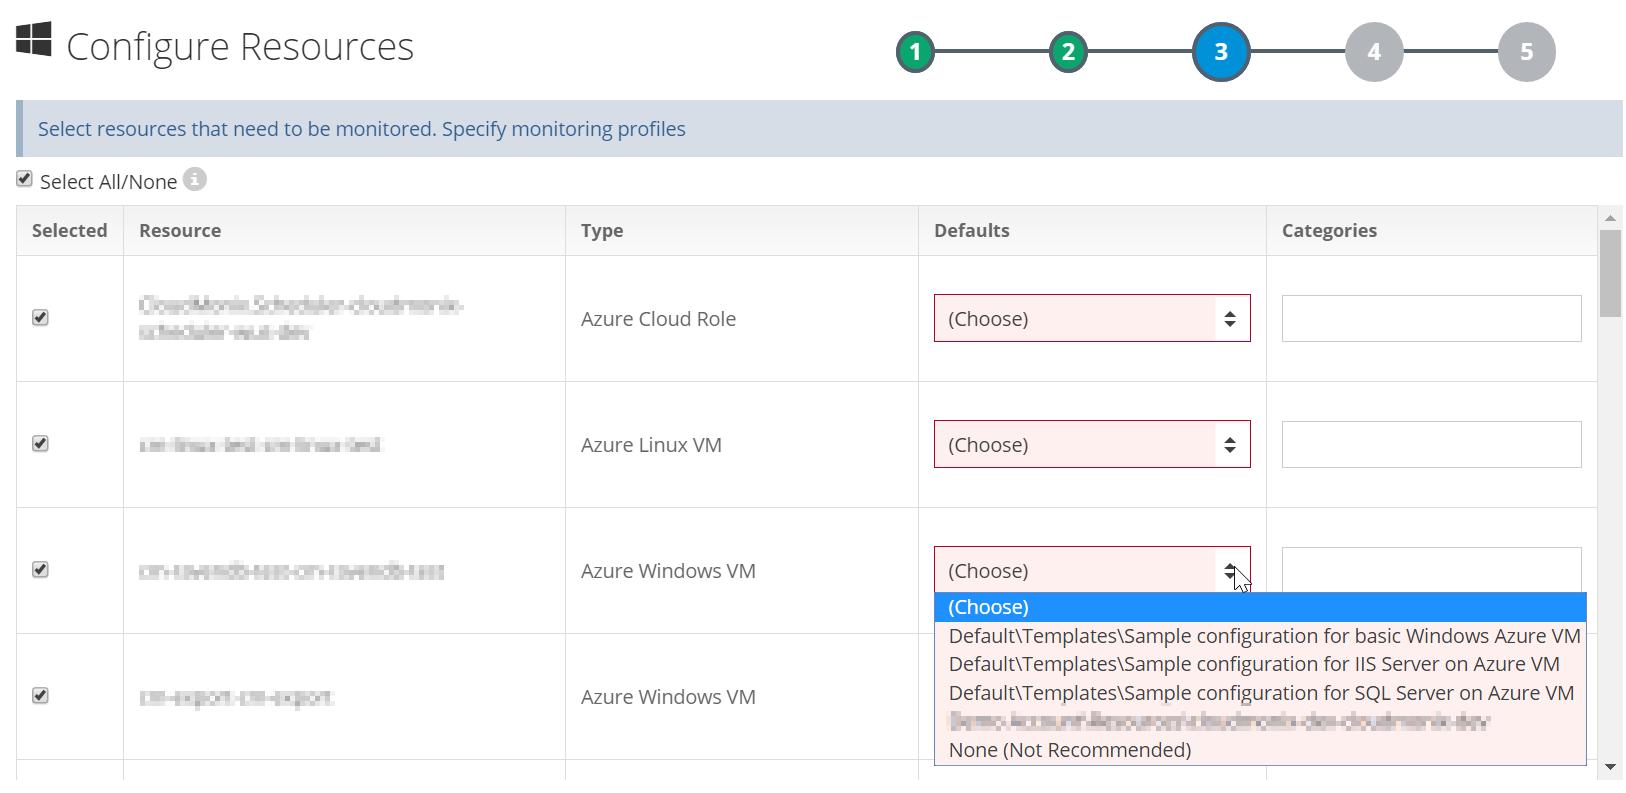 Azure Virtual Machines (Windows) - Monitoring and Automating